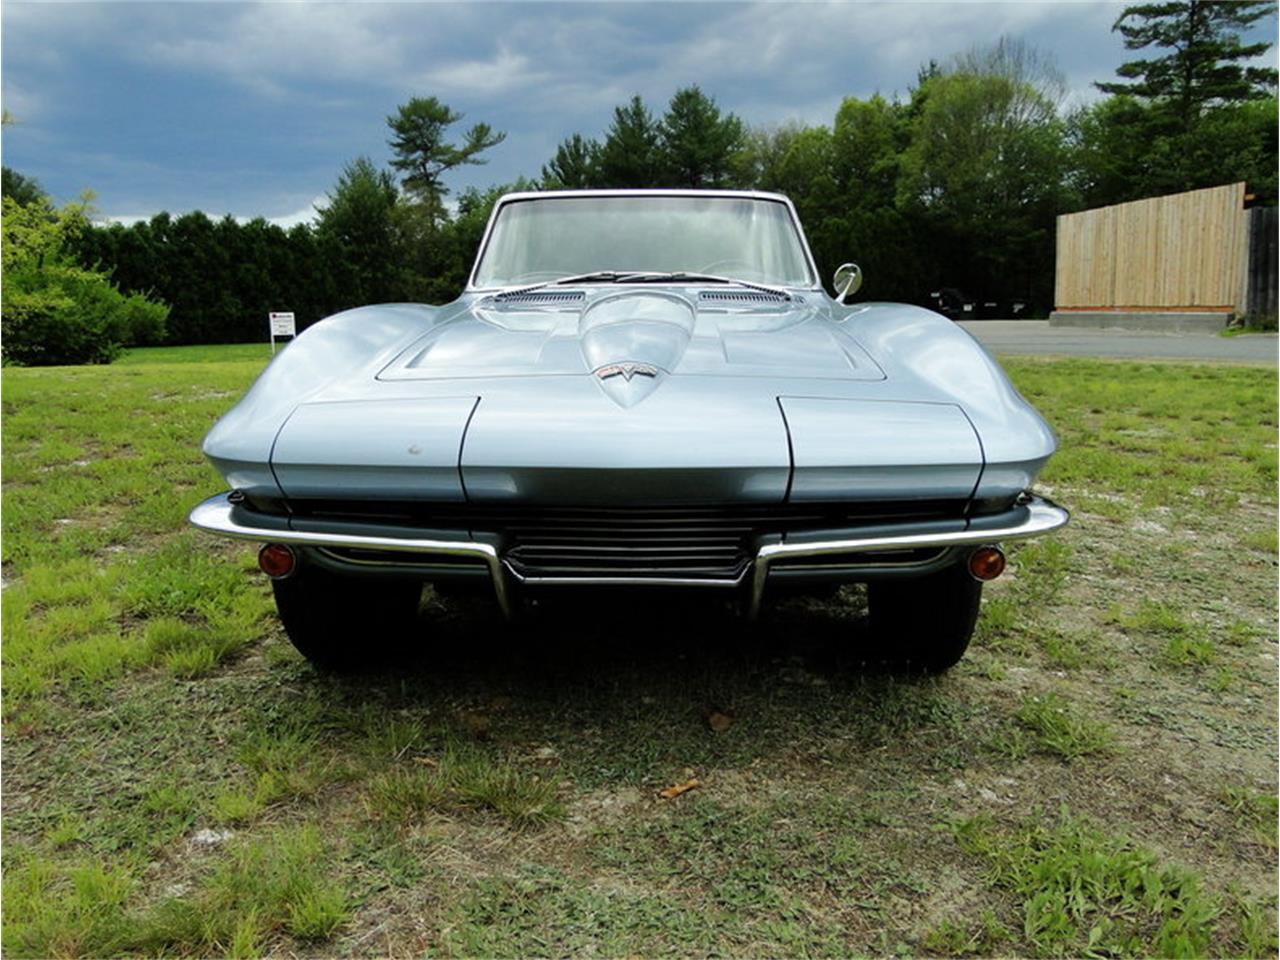 Large Picture of Classic '64 Chevrolet Corvette located in Massachusetts - $39,990.00 - LDZM